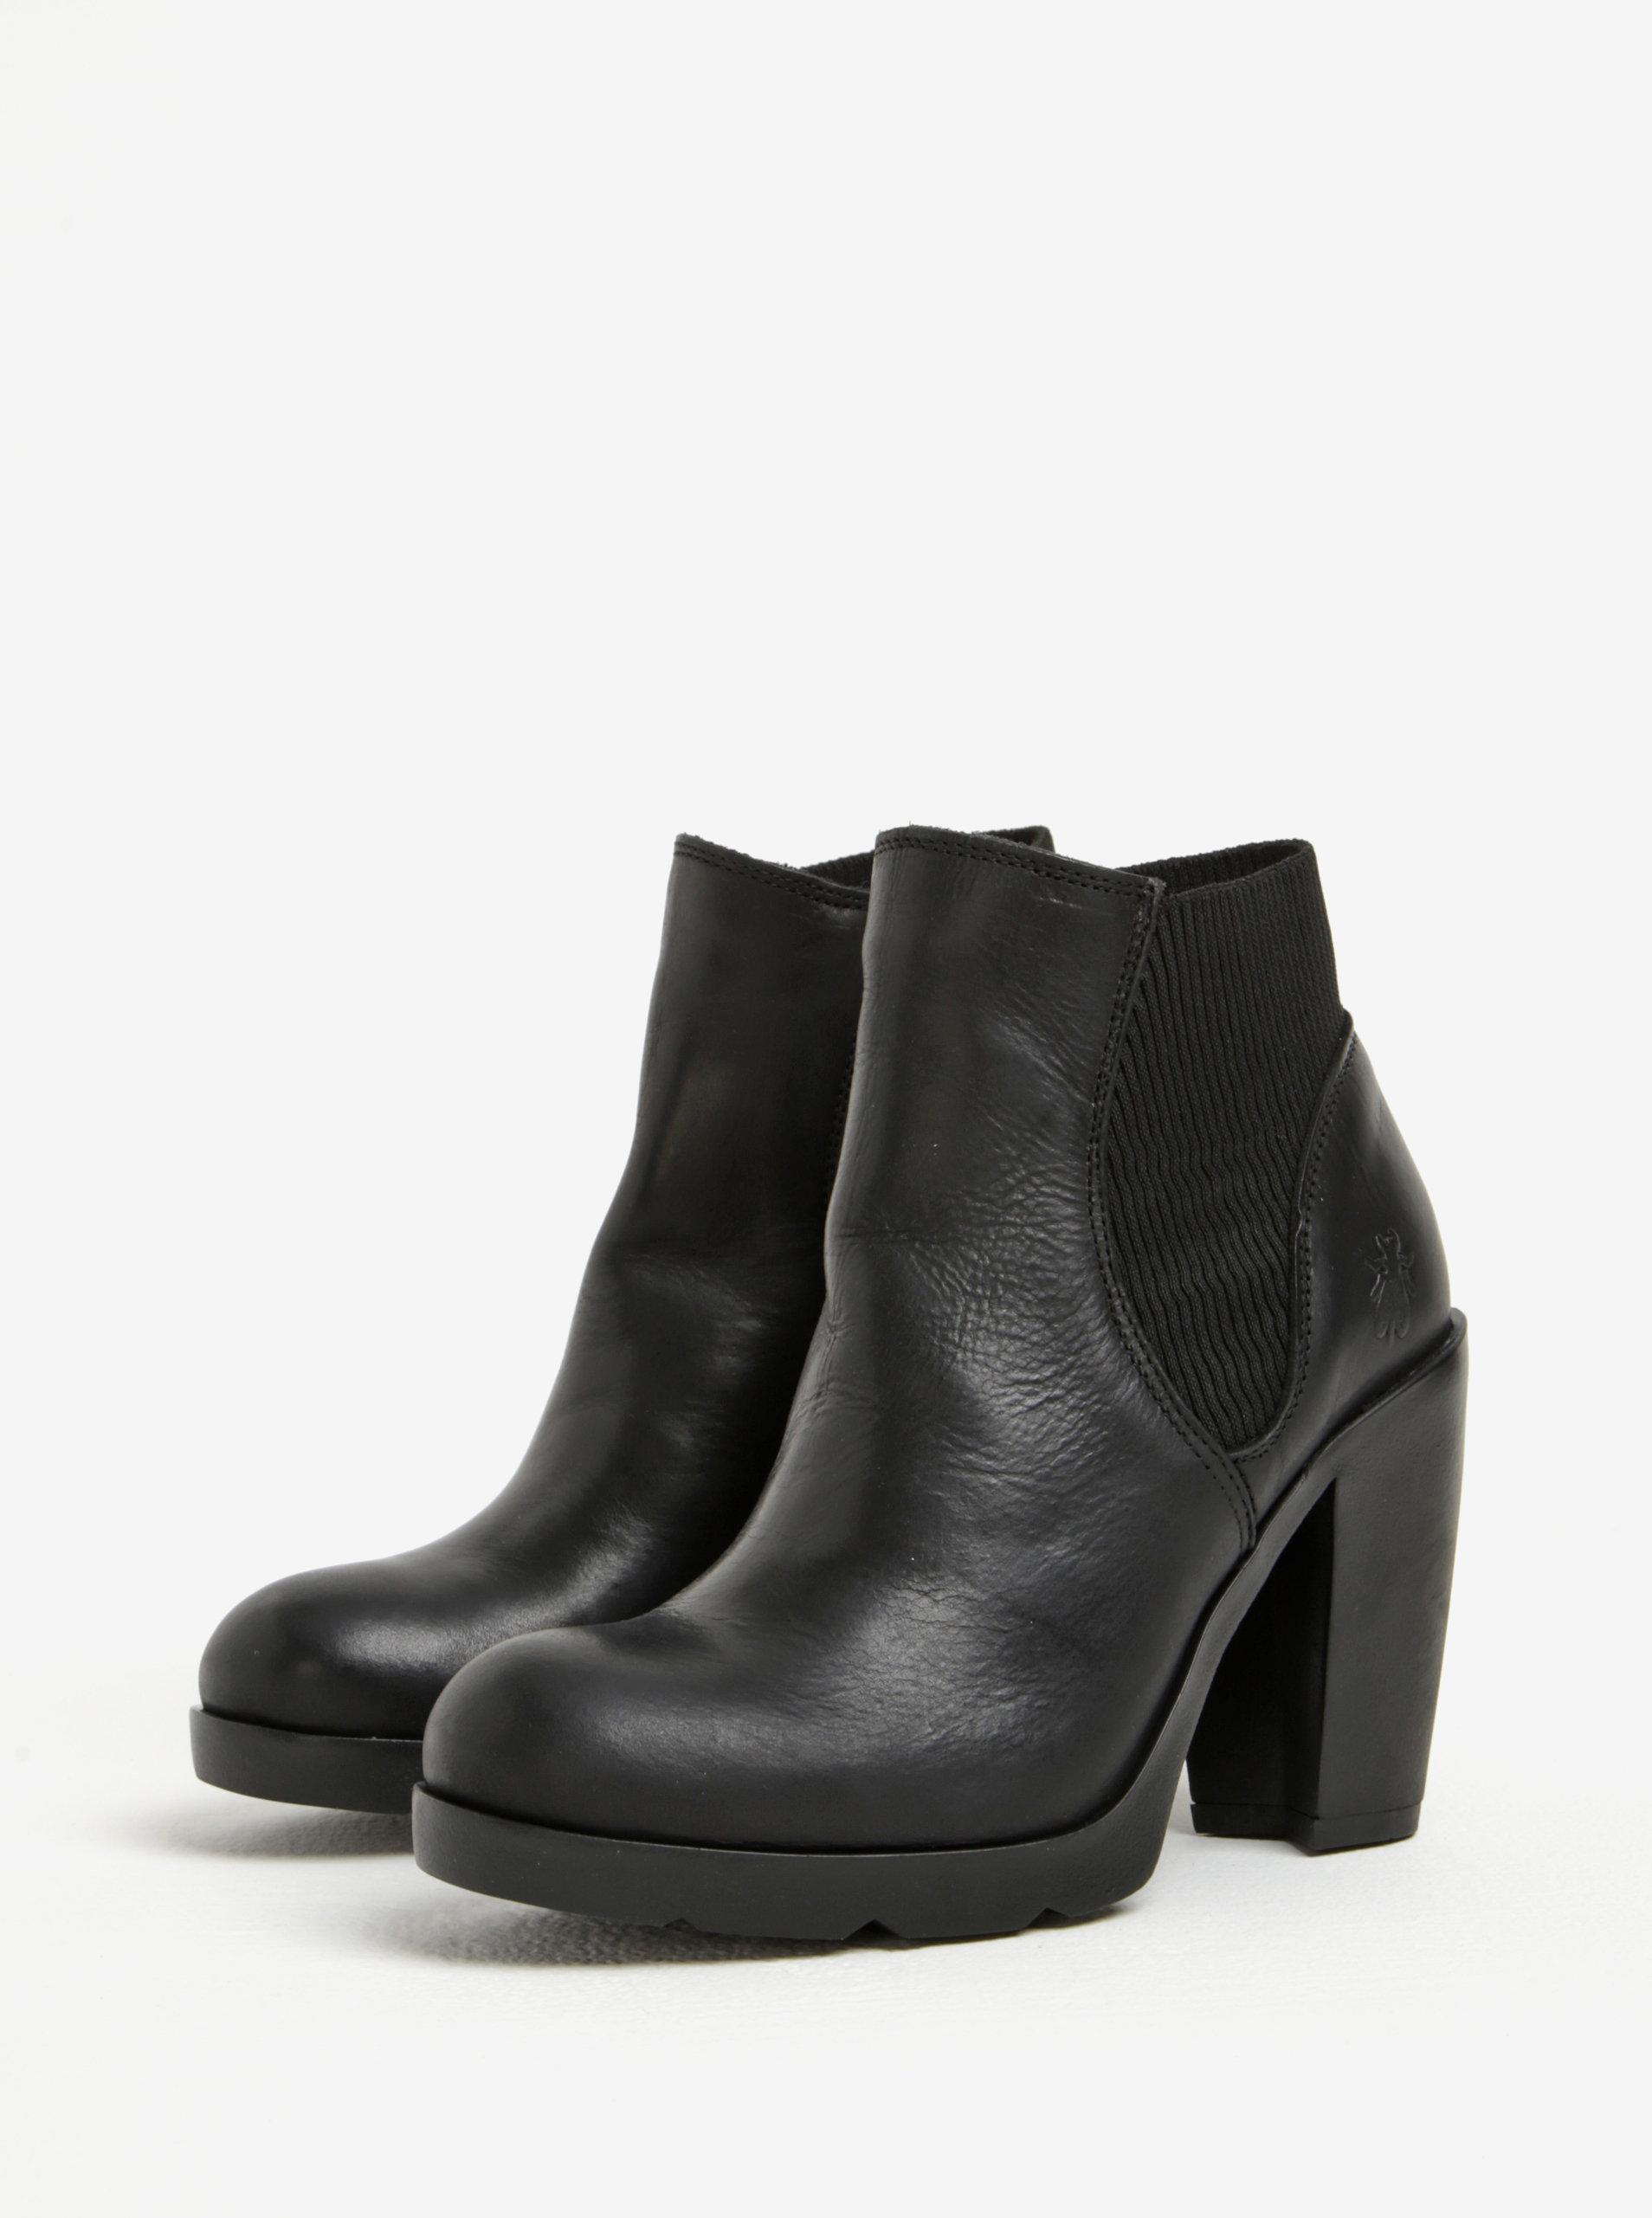 34893e2b625b Čierne dámske kožené chelsea topánky na vysokom podpätku Fly London ...